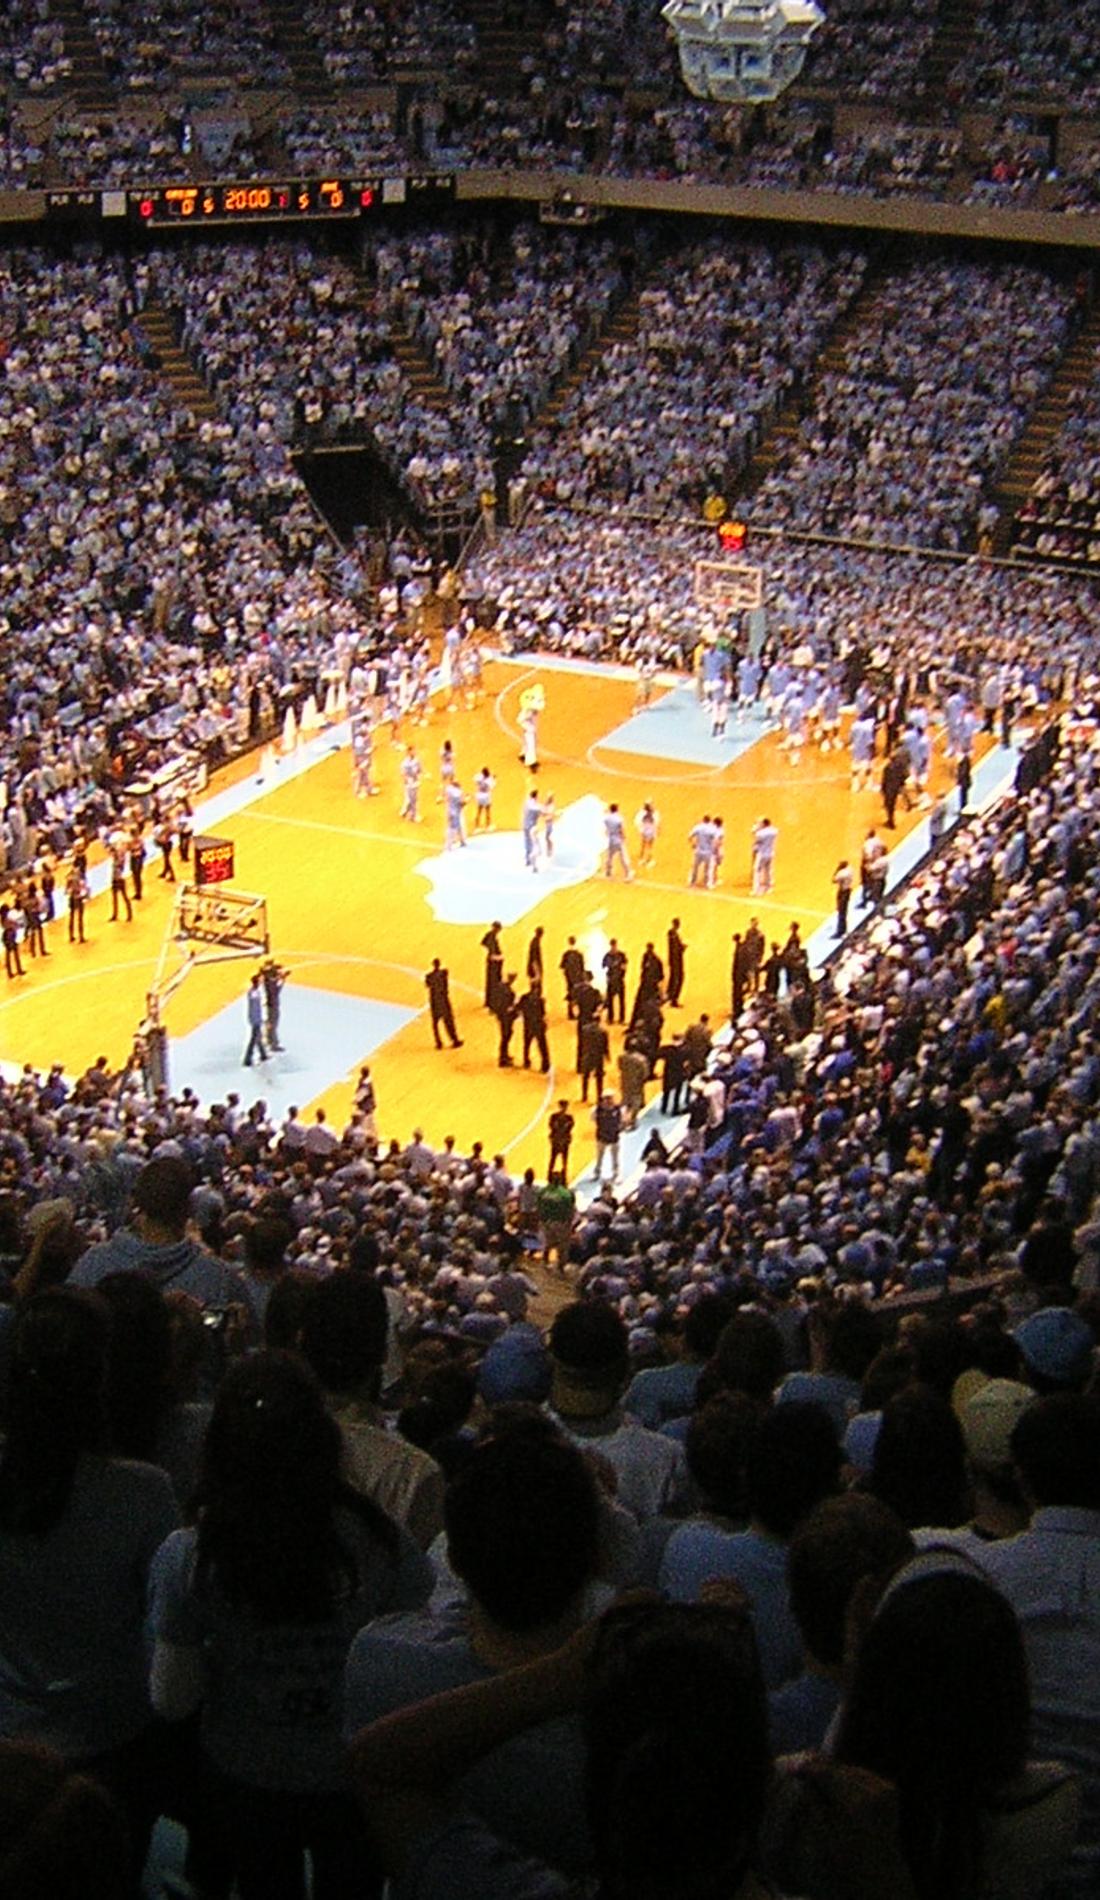 A North Carolina Tar Heels Basketball live event